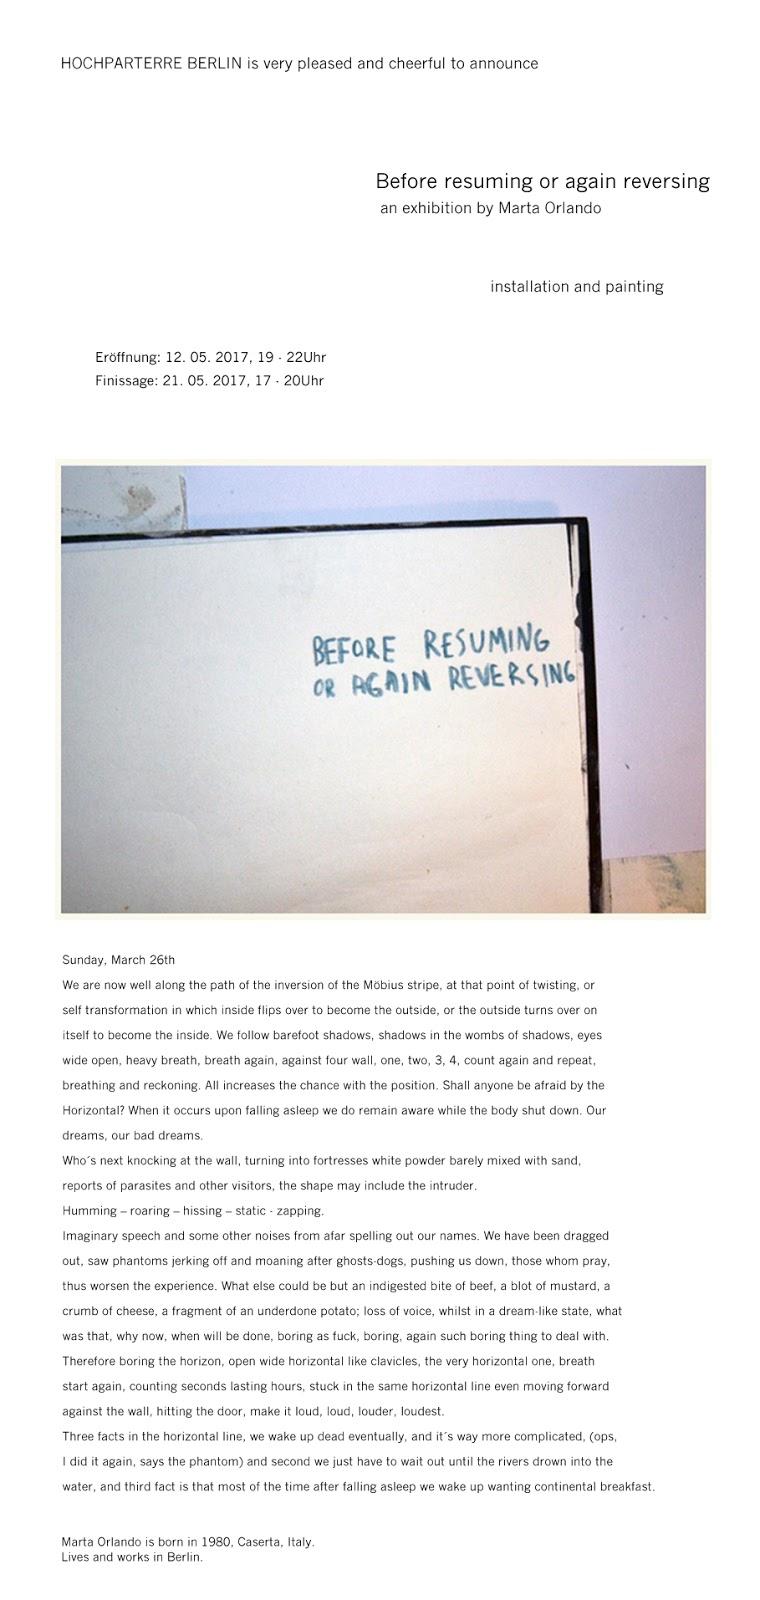 berfor resuming or again reversing exibition by marta orlando